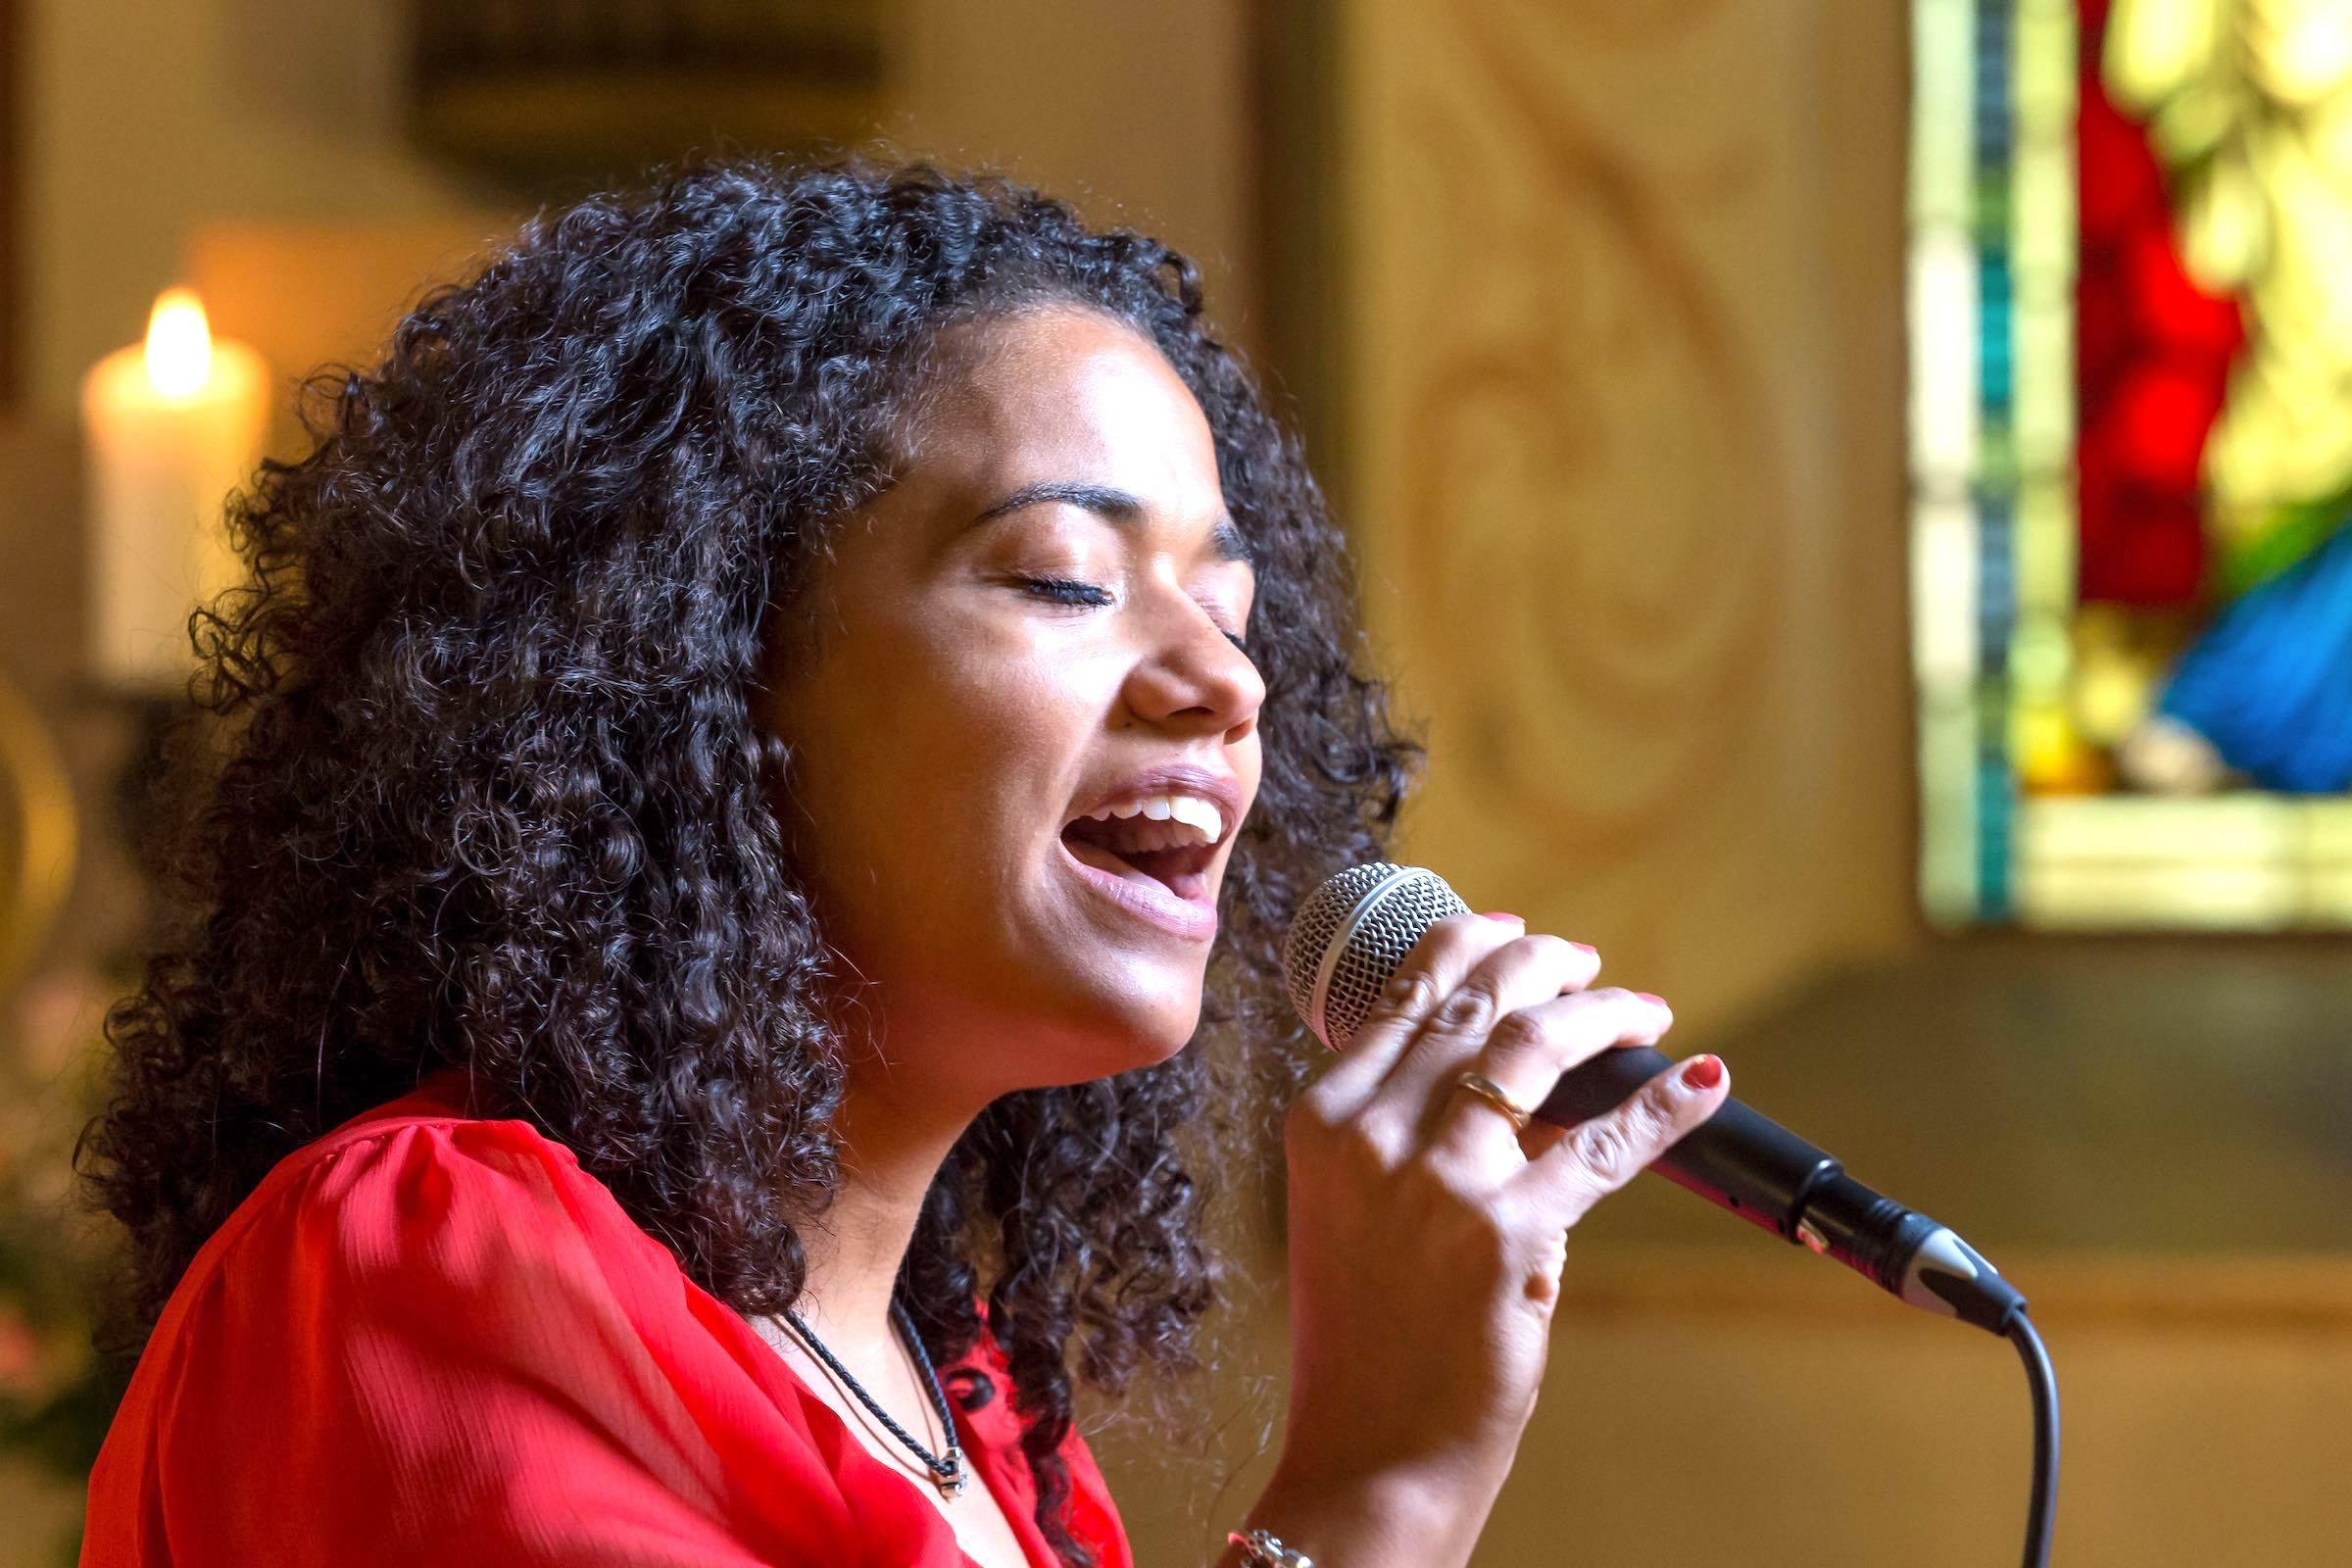 hochzeitssängerin | Sängerin | Kirchensängerin | Hochzeit | Lieder | Sängerin | Trauung | Sängerin | Trauung | Sängerin | Kirche | Preise | Buchen | Mieten | Nathalie | Chérestal | Lehmann | Eventservice